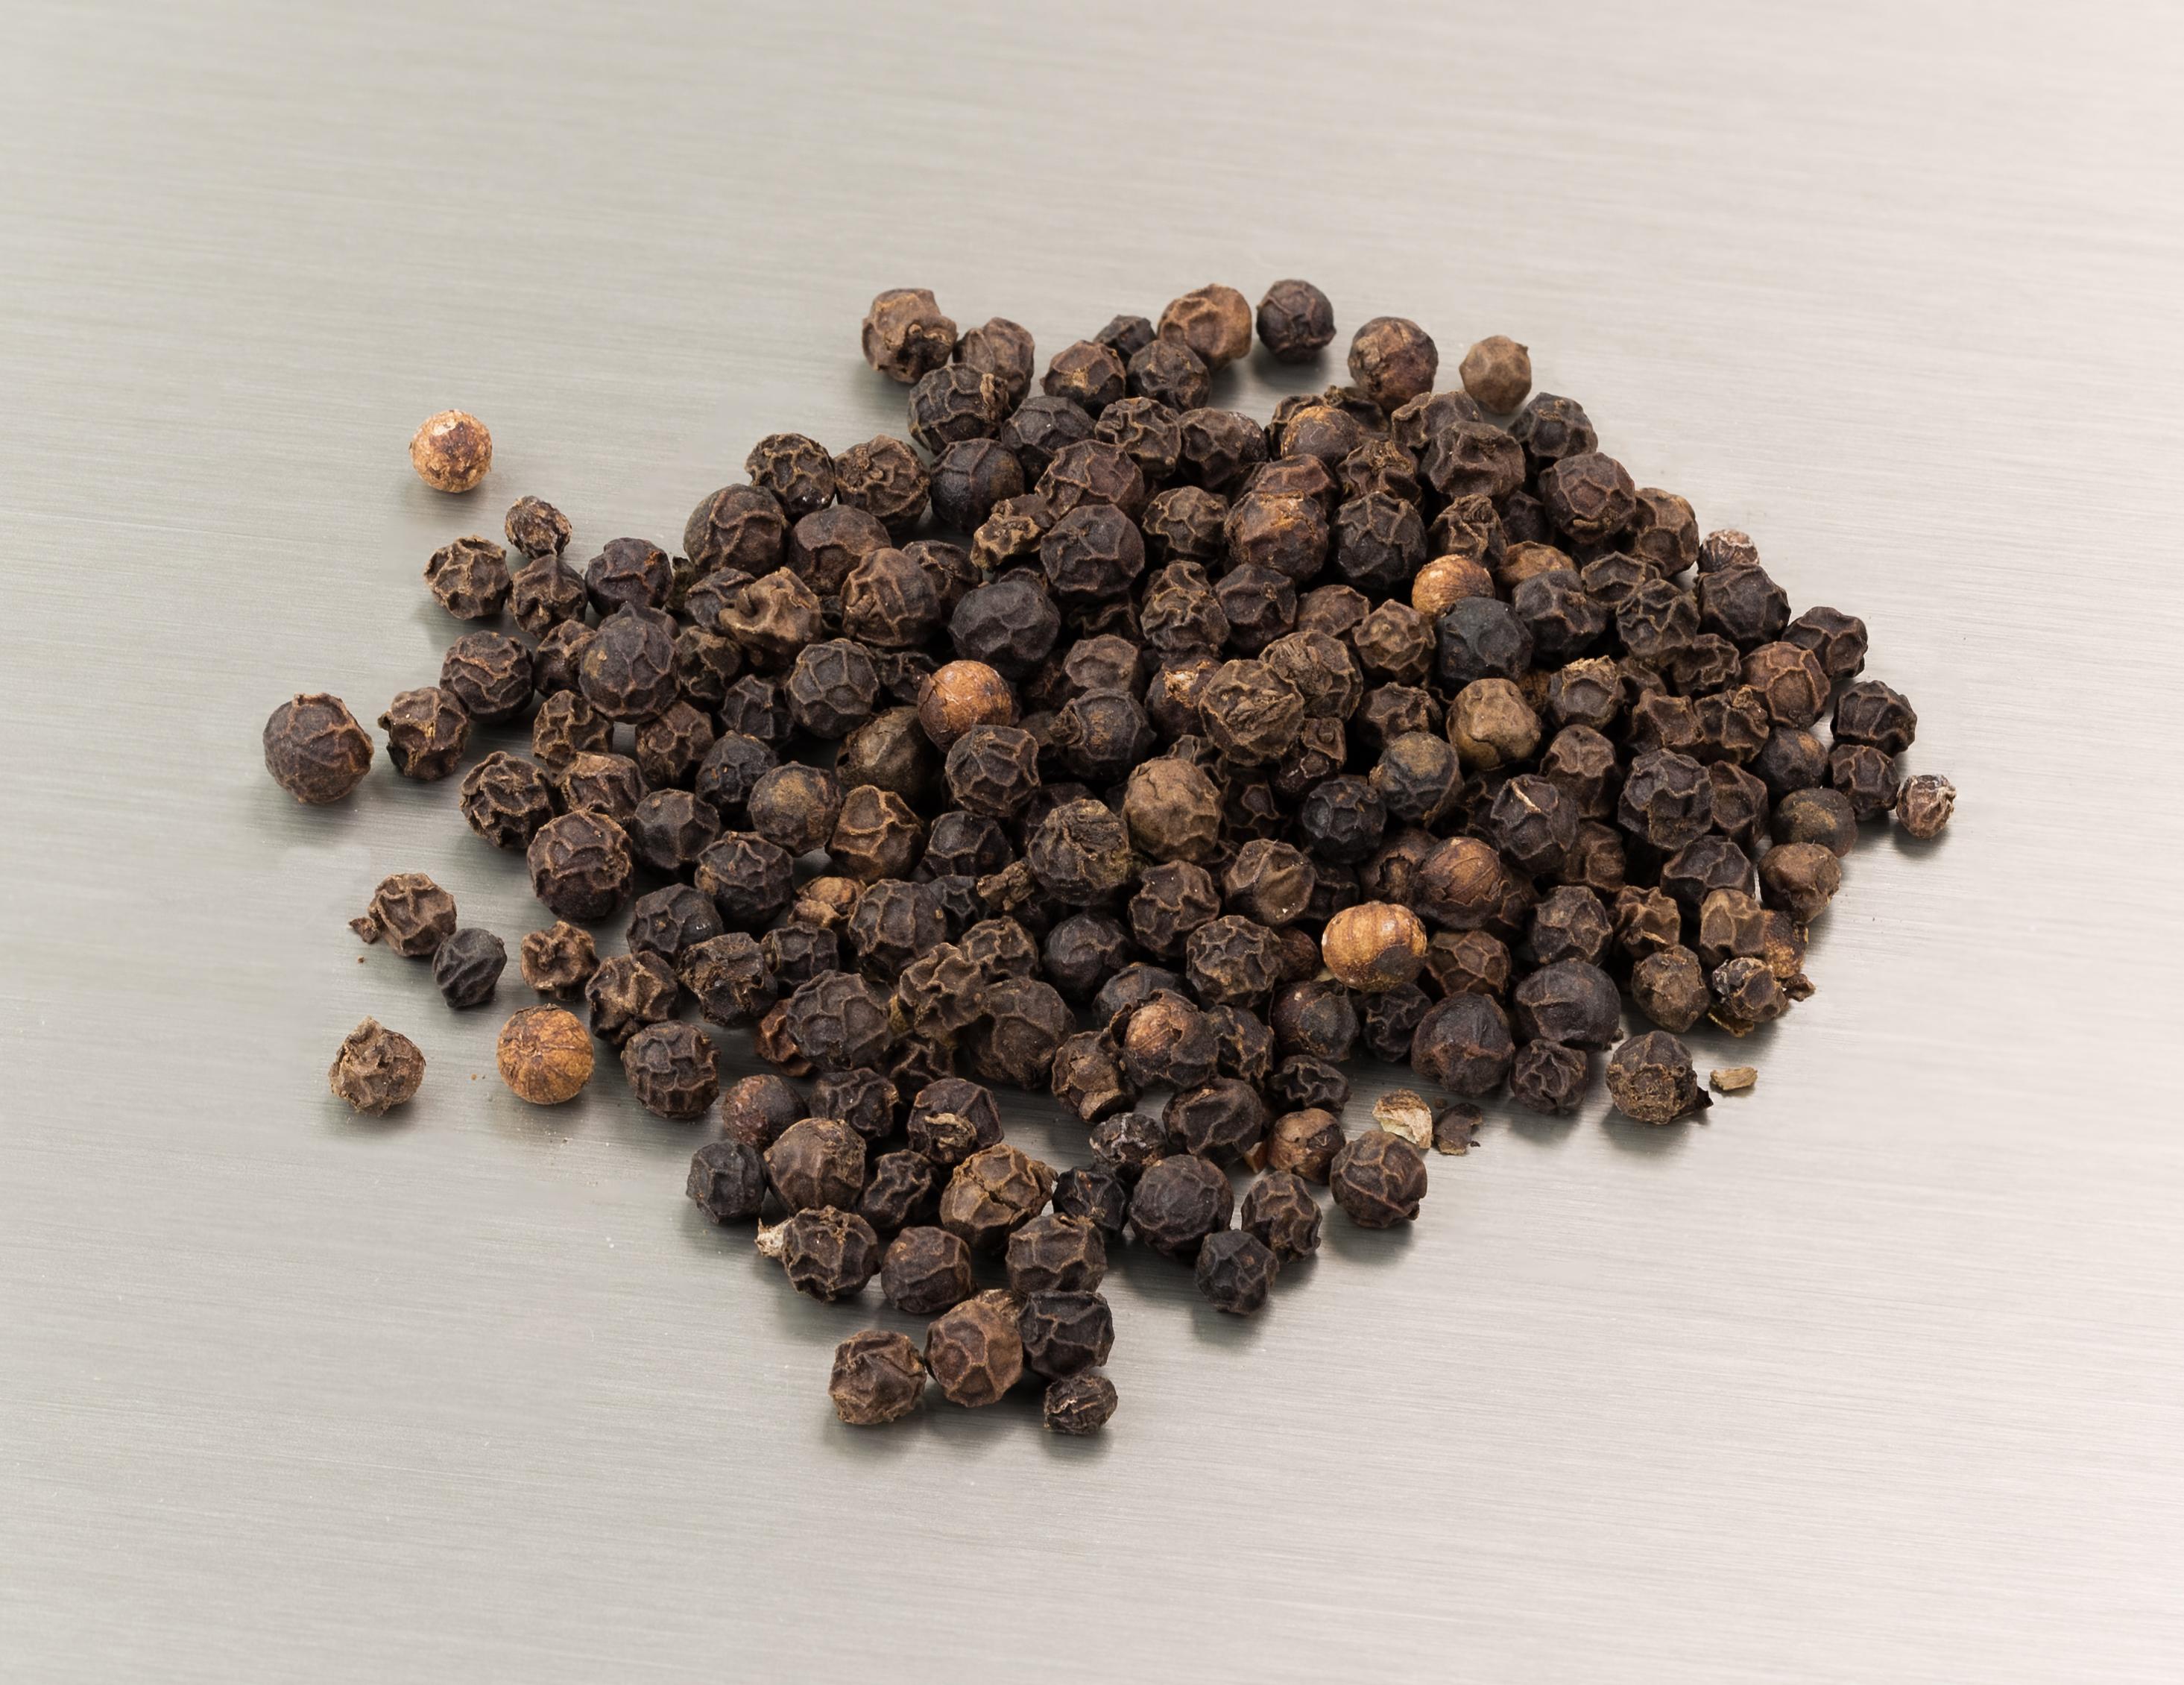 Salt & Pepper image